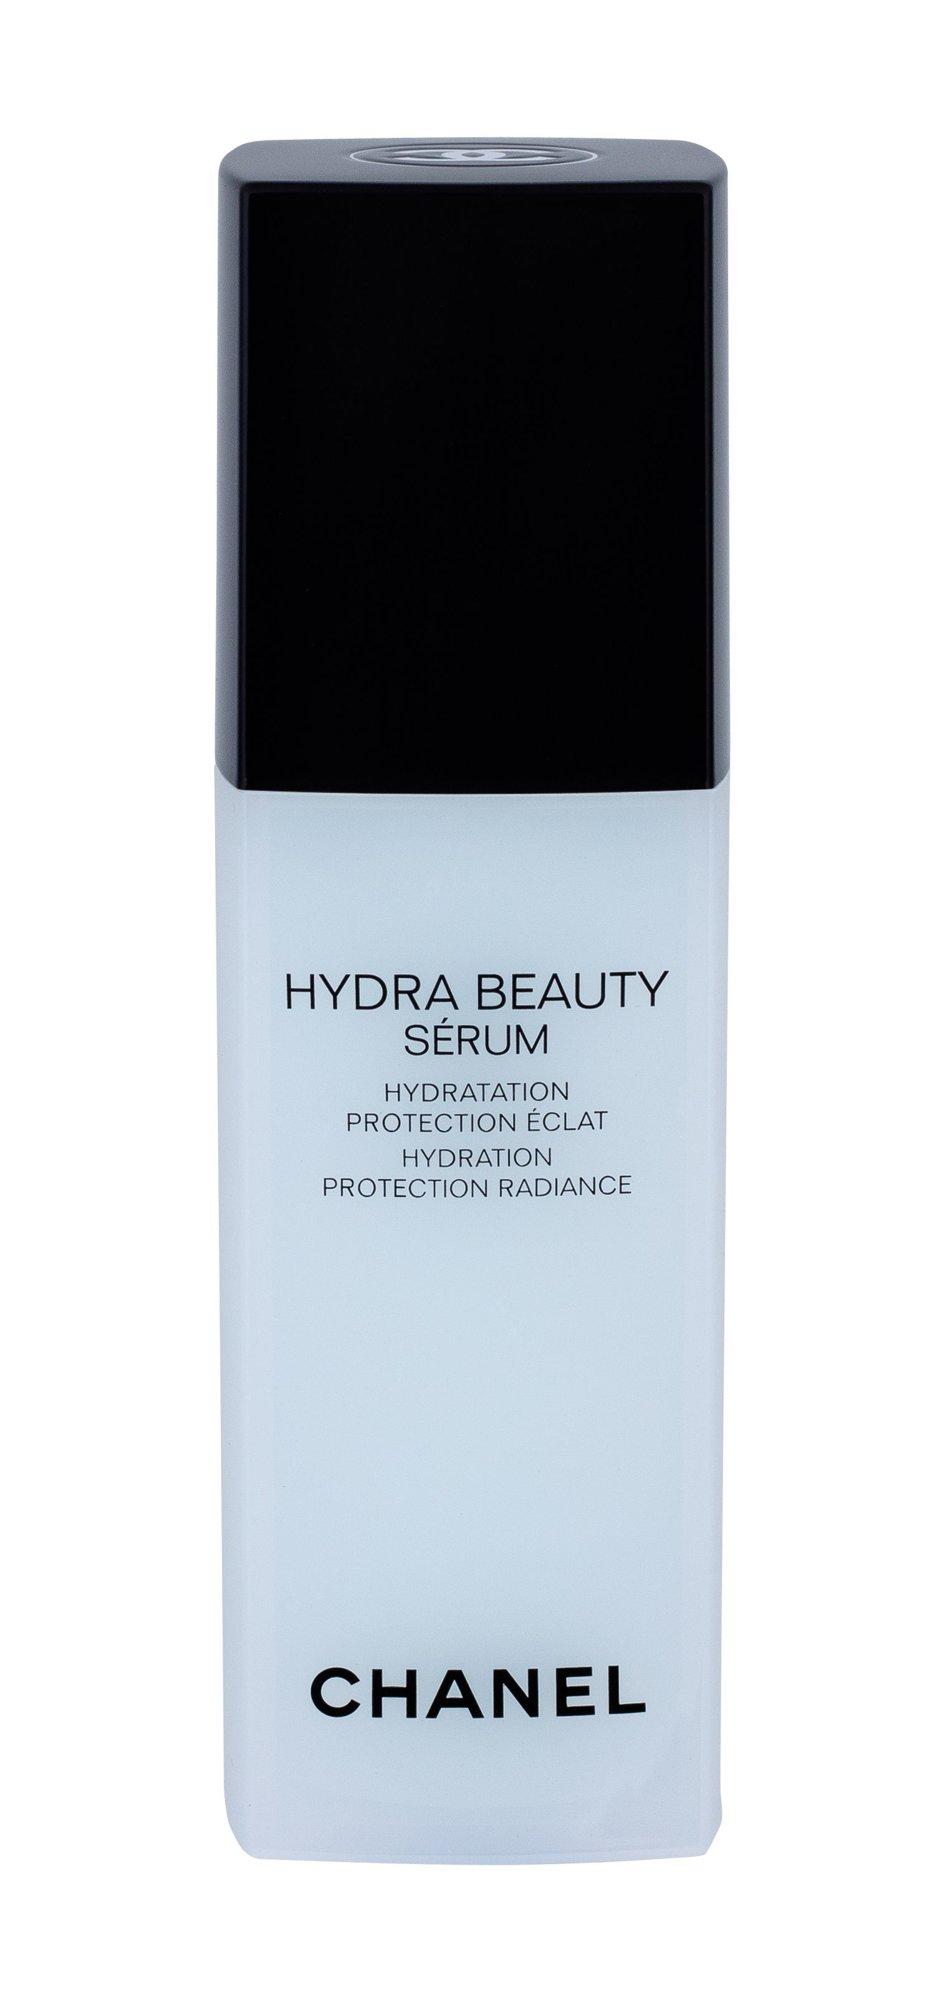 Chanel Hydra Beauty Skin Serum 50ml